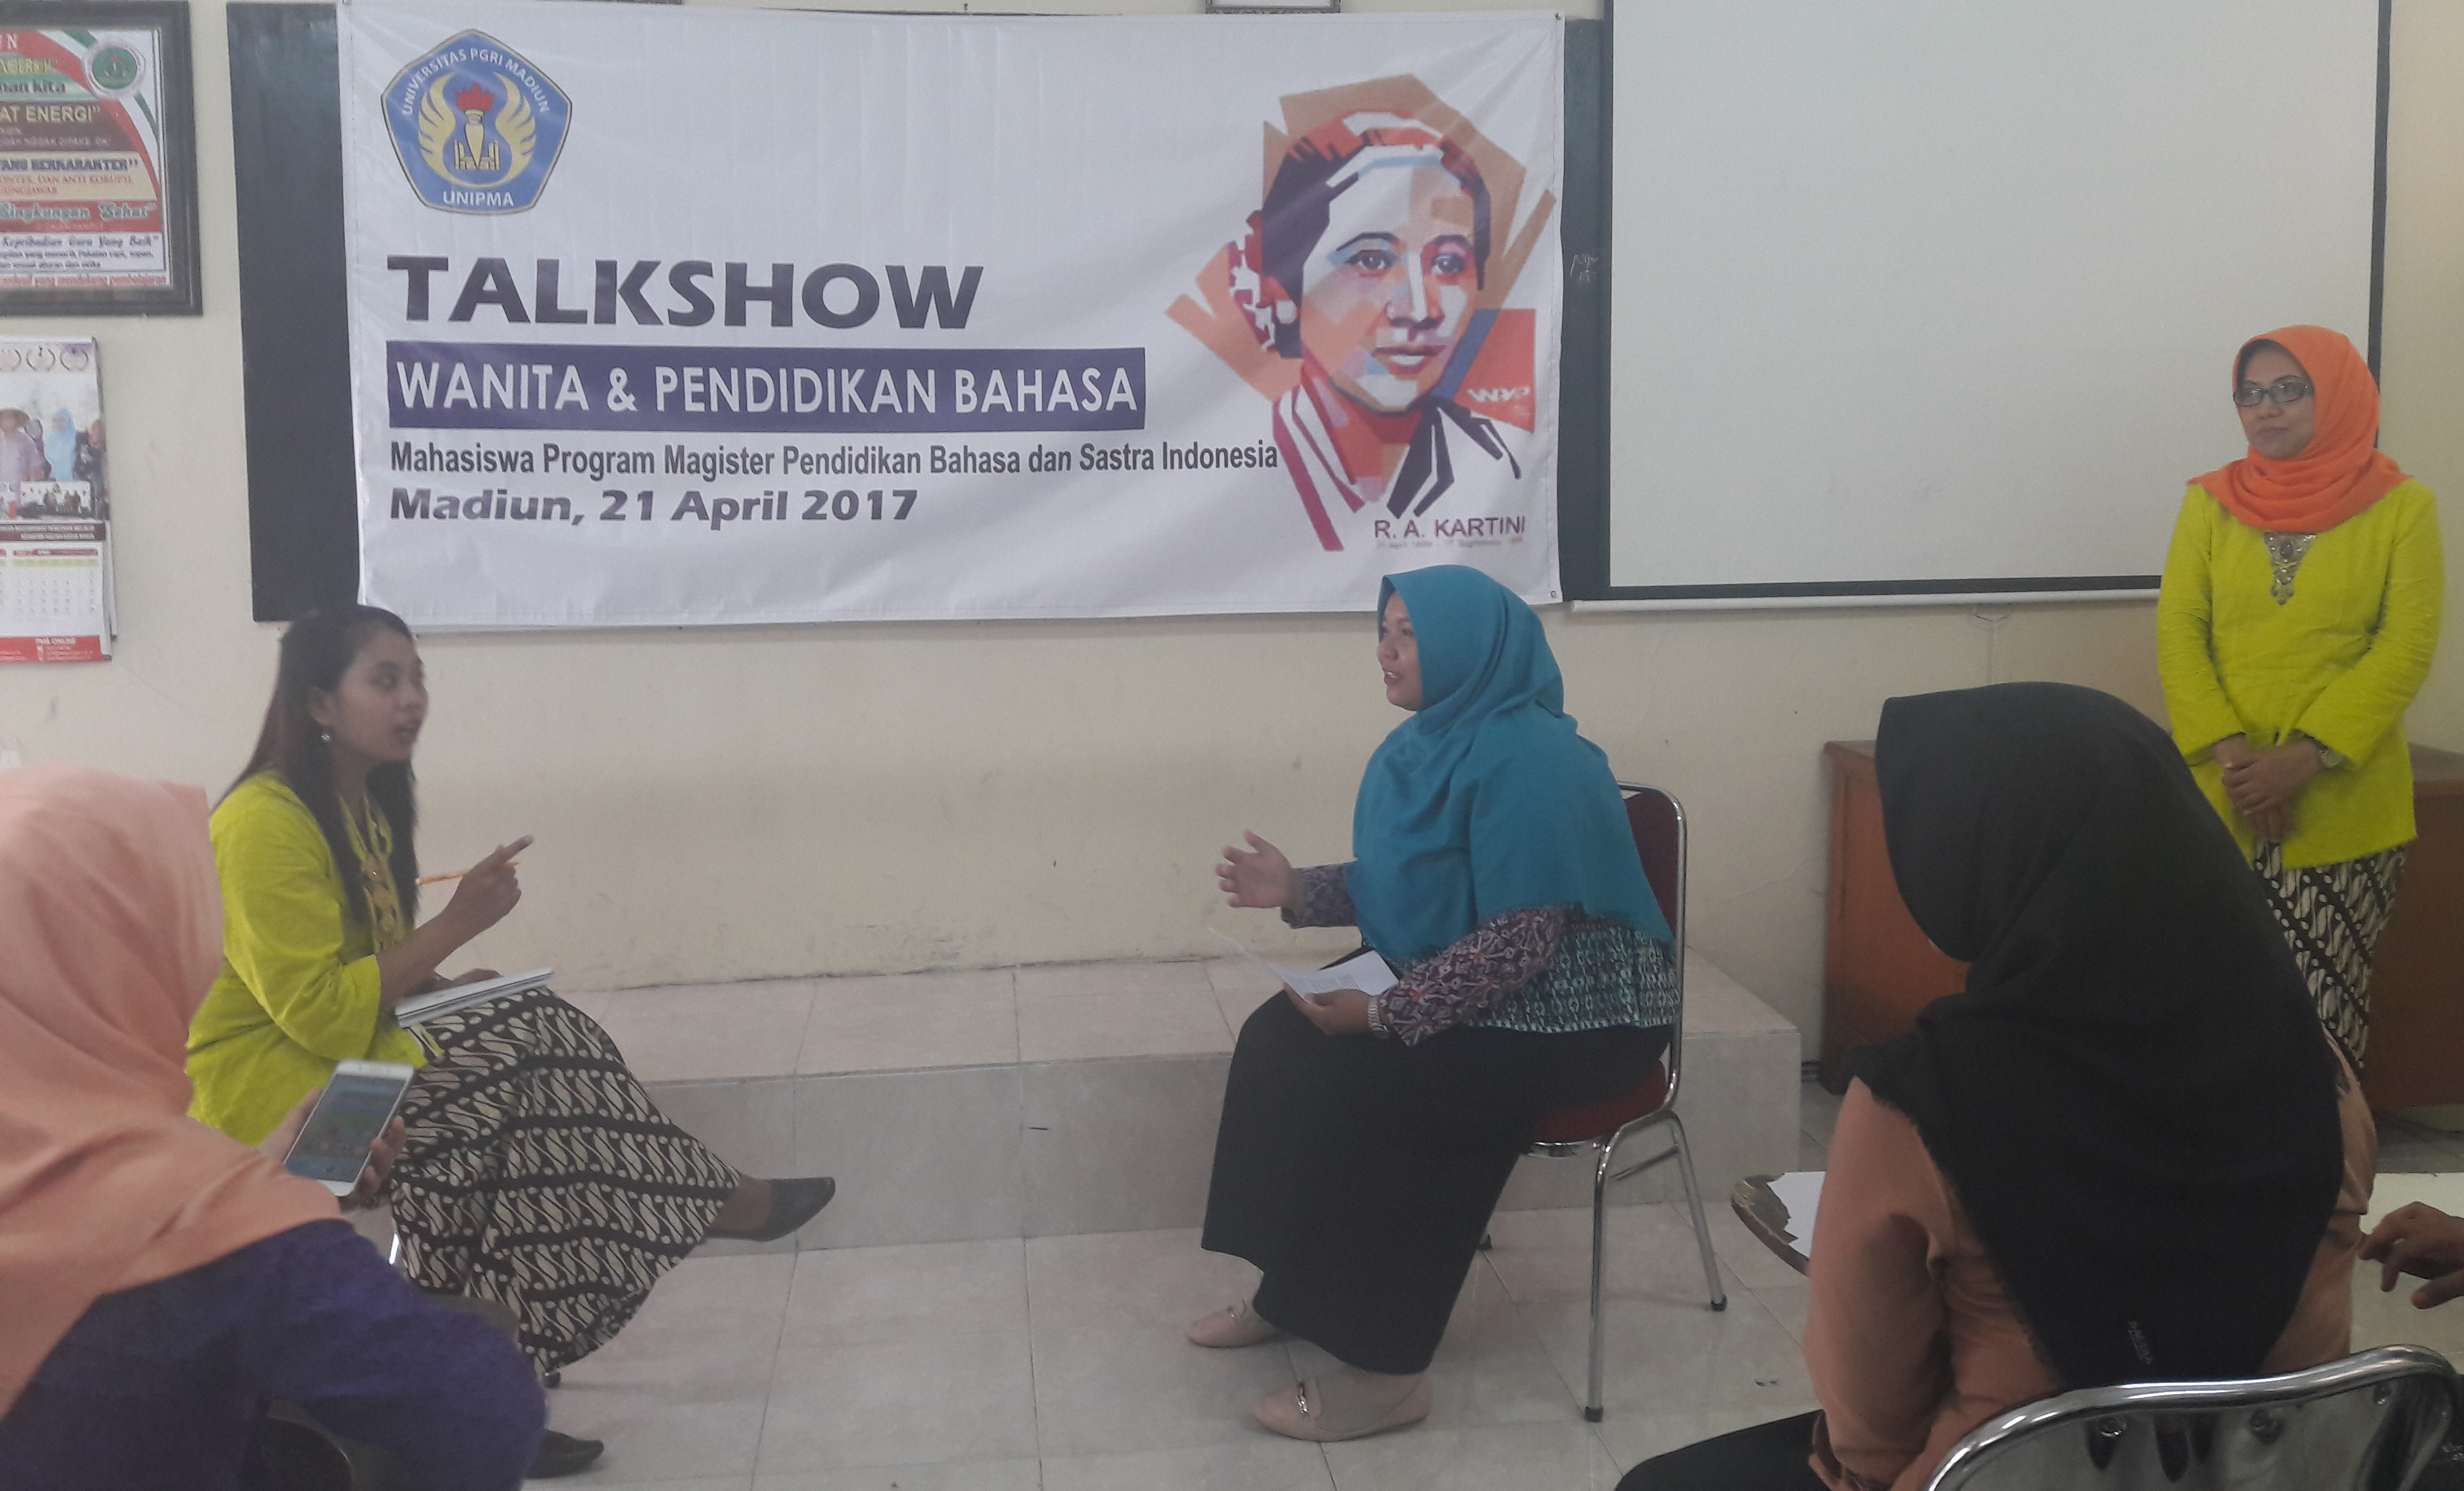 Talkshow Wanita & Pendidikan Bahasa